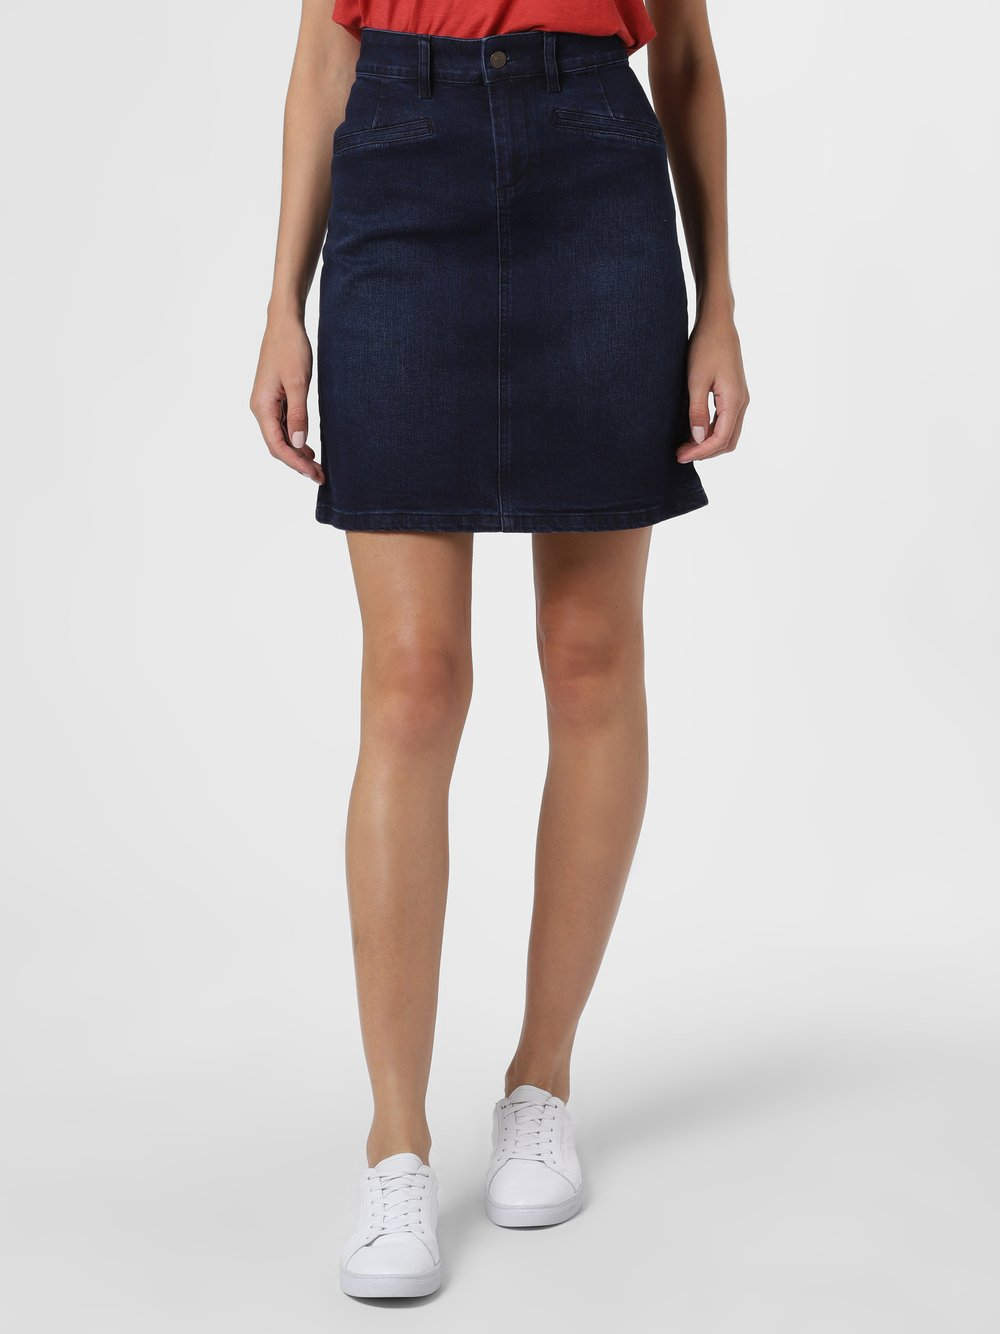 Marie Lund - Jeansowa spódnica damska, niebieski